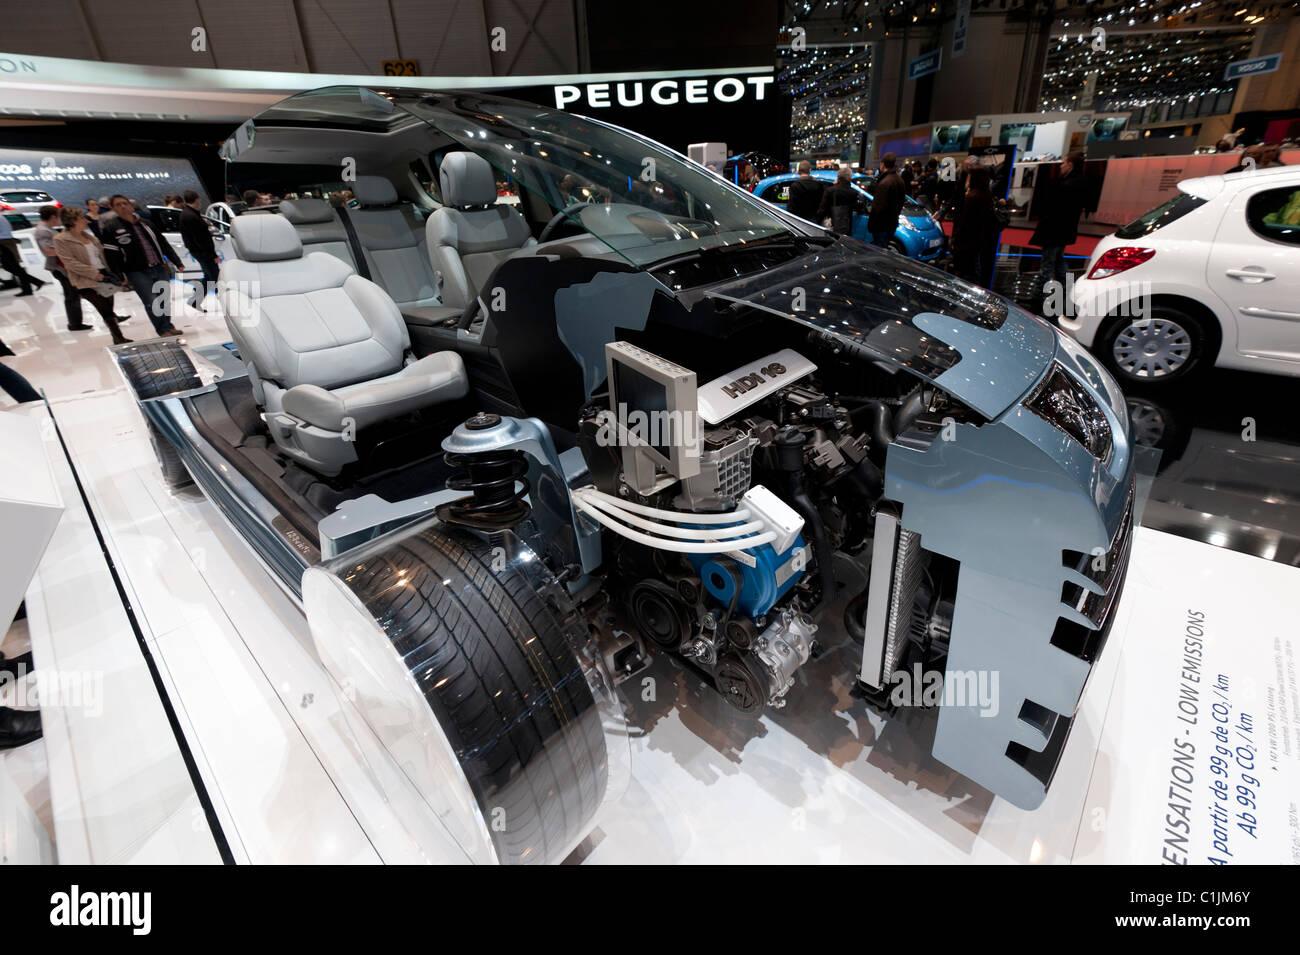 Cut away model of Peugeot 308 with new super efficient engine at Geneva Motor Show 2011 Switzerland - Stock Image